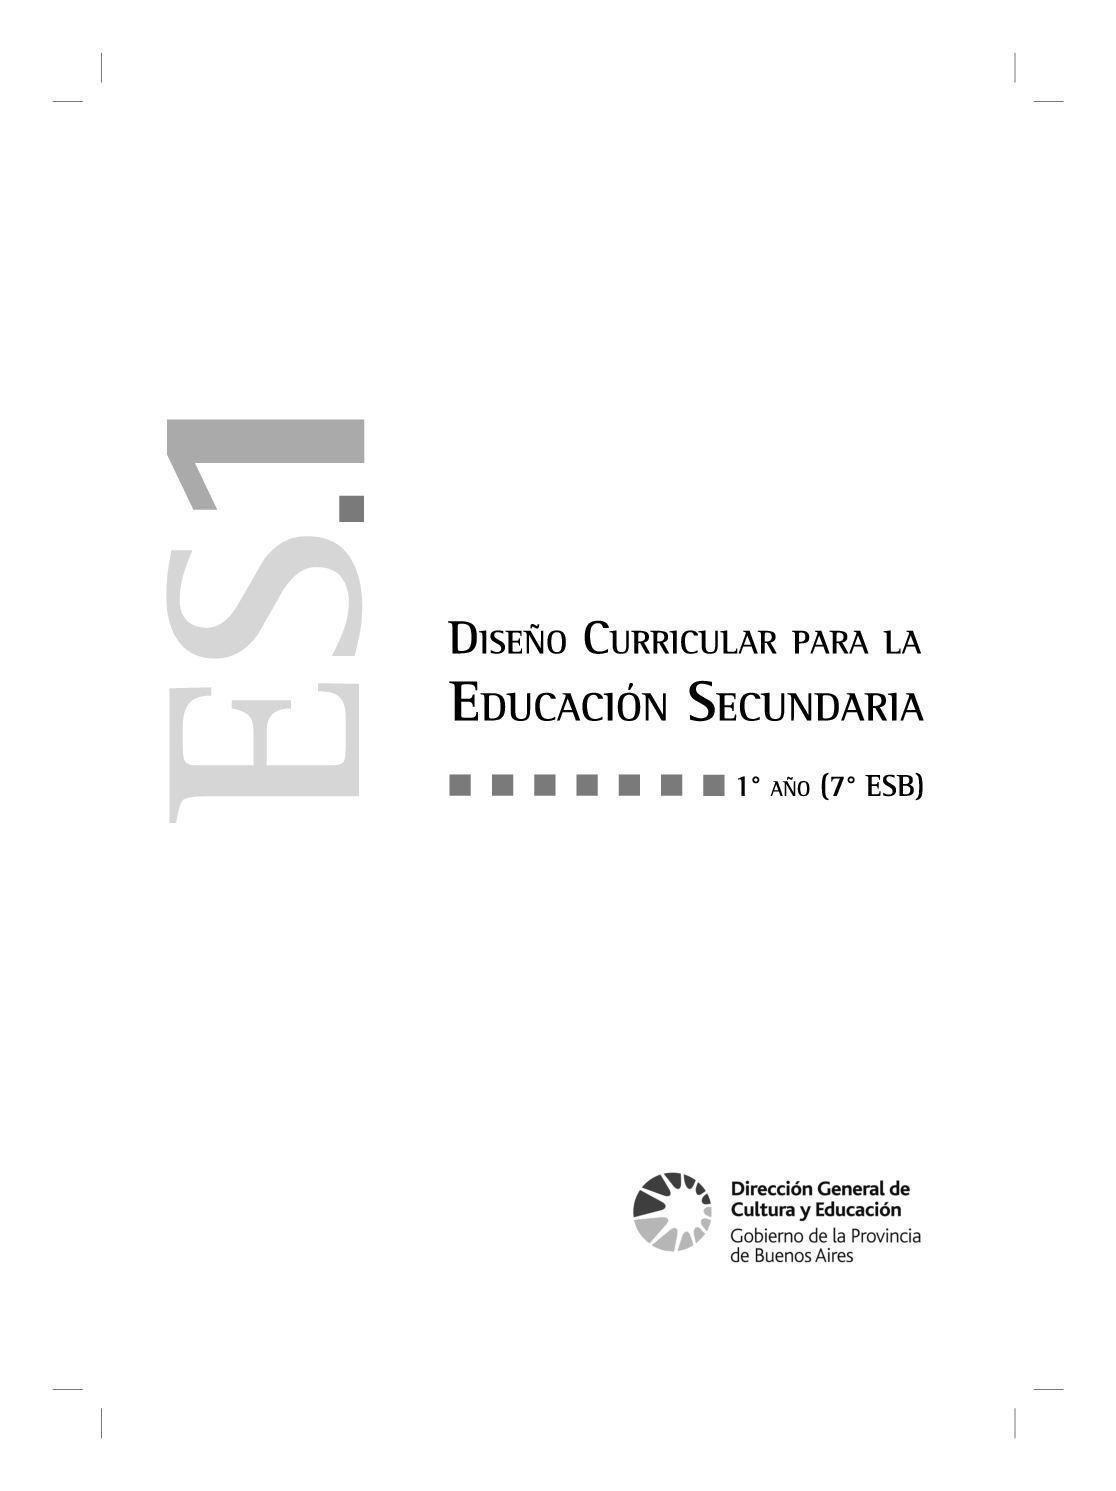 Calaméo - Diseño Curricular Secundaria 1º año